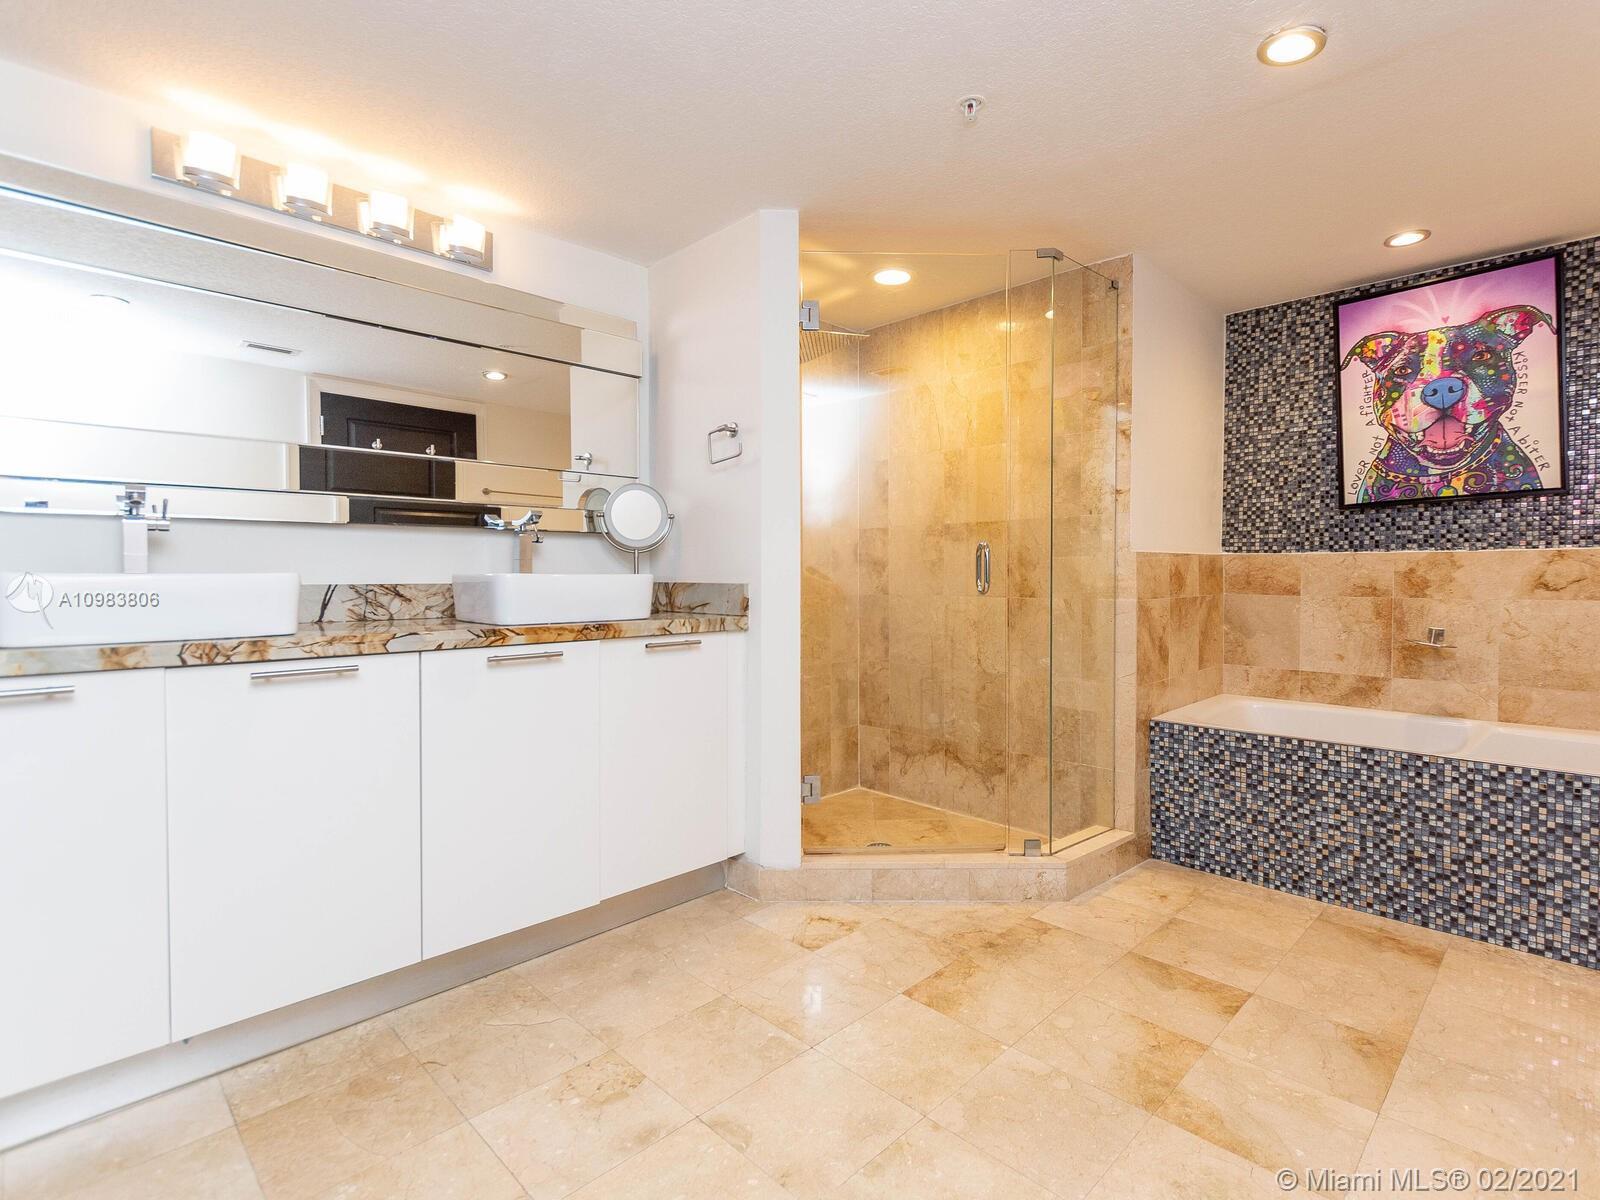 1800 N Bayshore Dr # 3414, Miami, Florida 33132, 2 Bedrooms Bedrooms, ,2 BathroomsBathrooms,Residential,For Sale,1800 N Bayshore Dr # 3414,A10983806